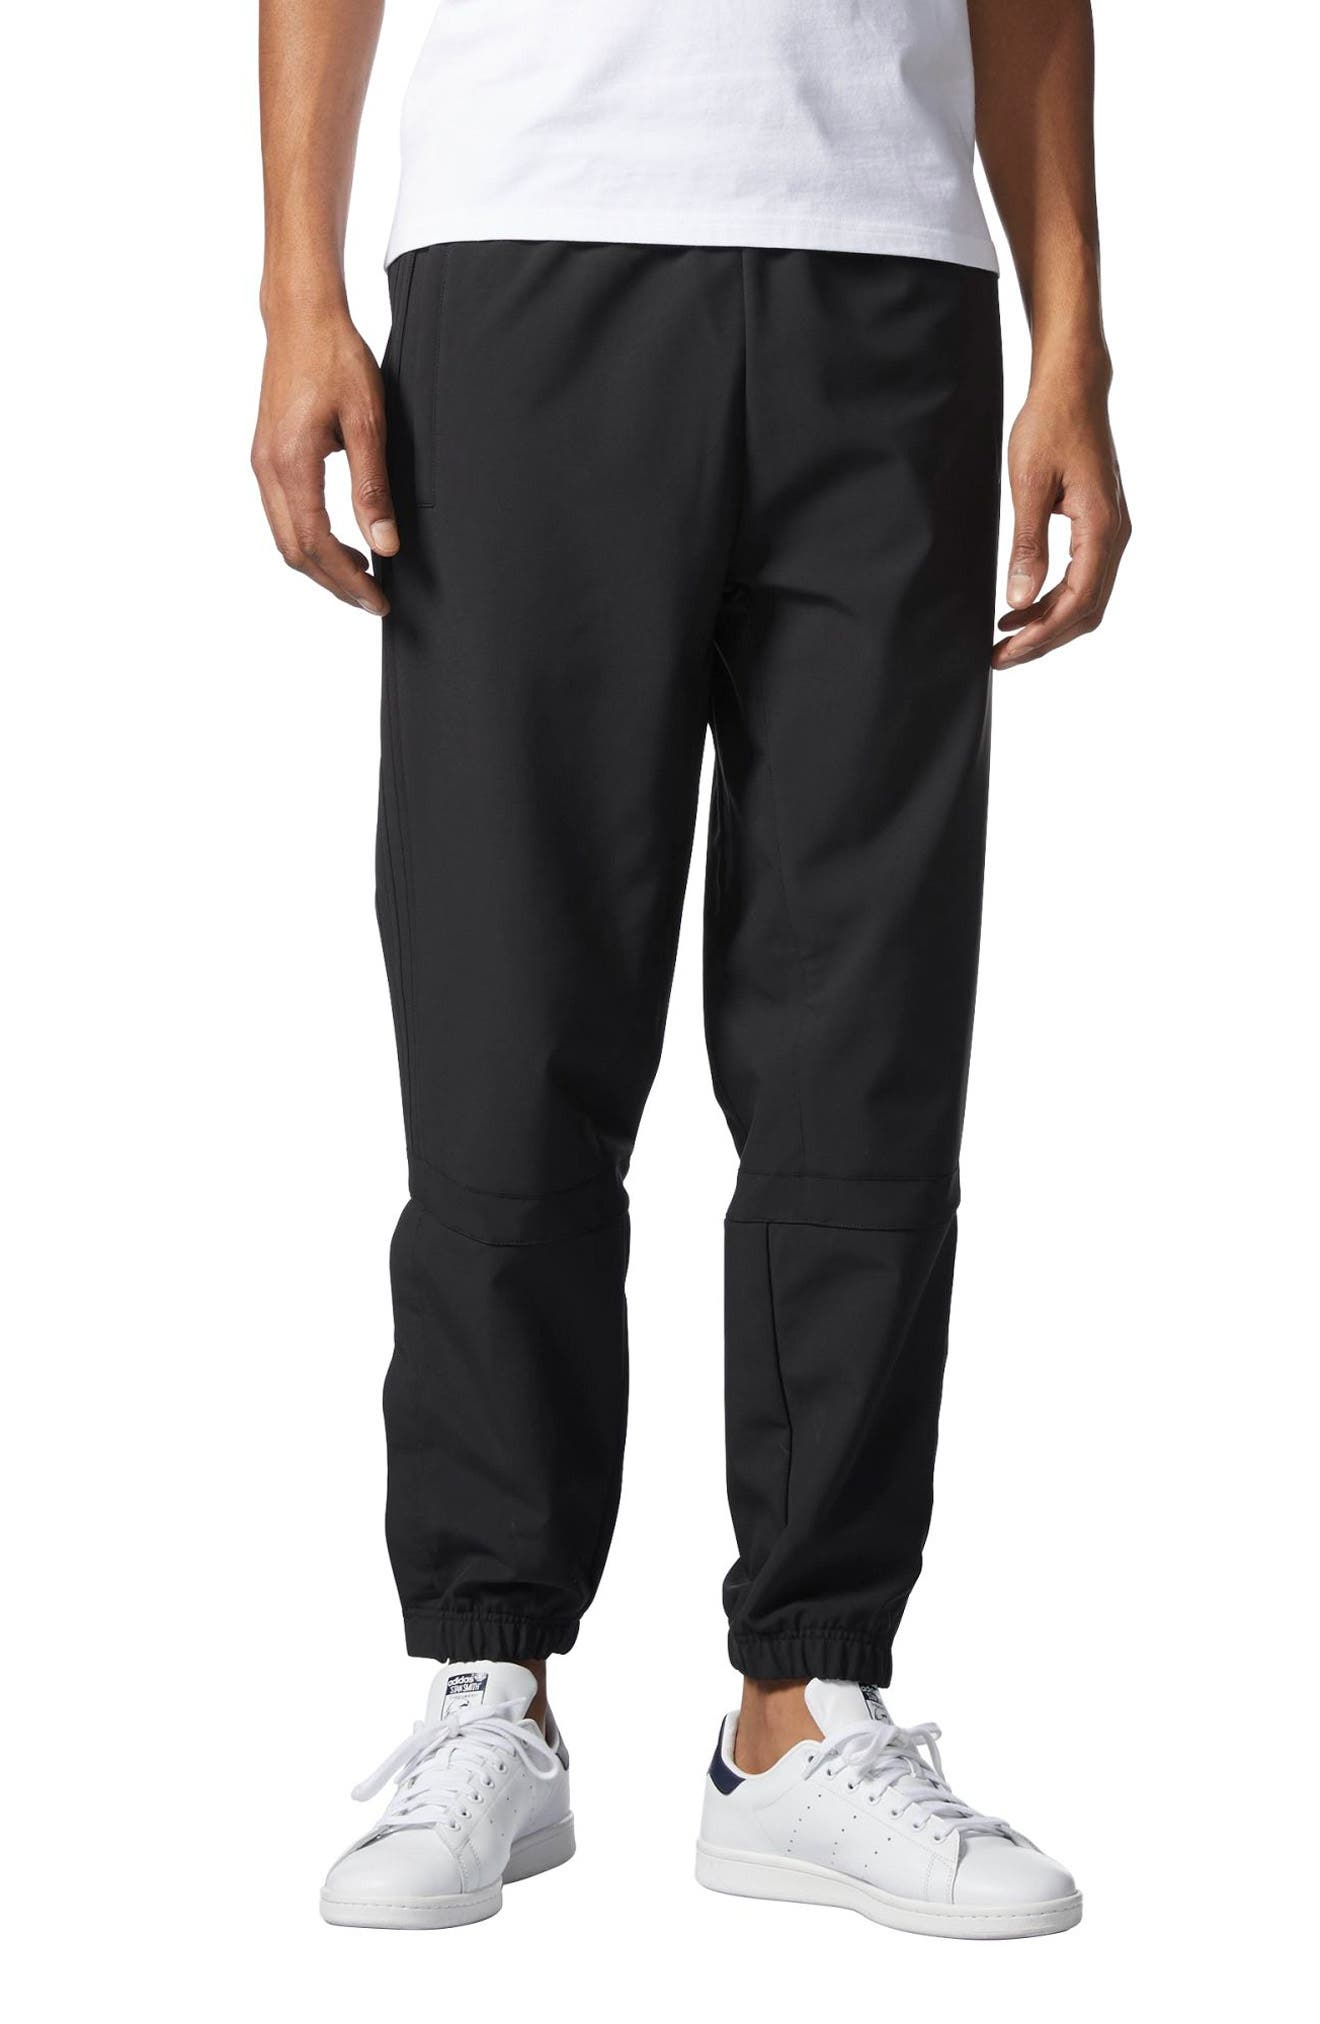 Originals CR8 Hybrid Pants,                         Main,                         color, Black